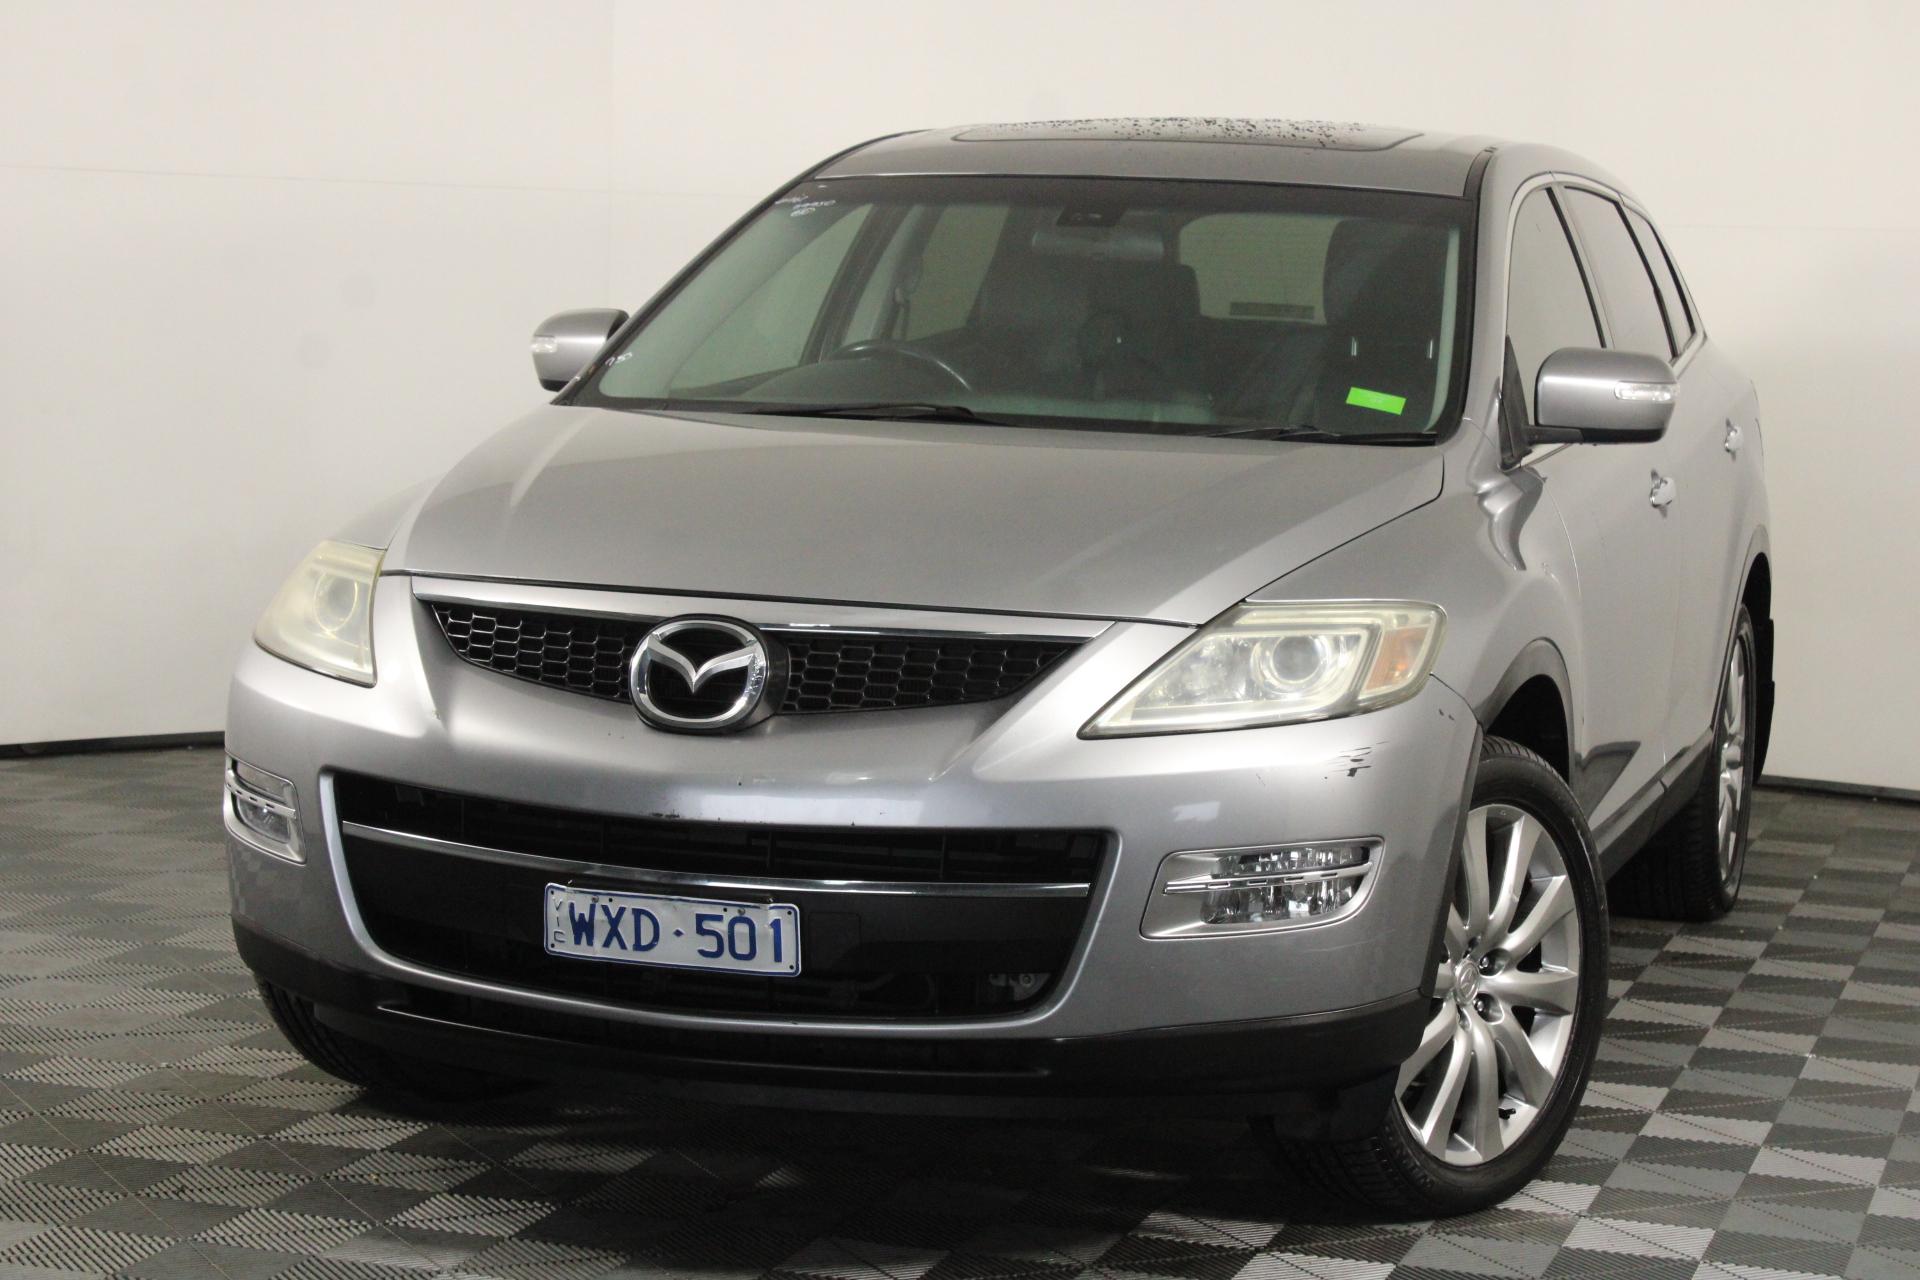 2008 Mazda CX-9 Luxury Automatic 7 Seats Wagon